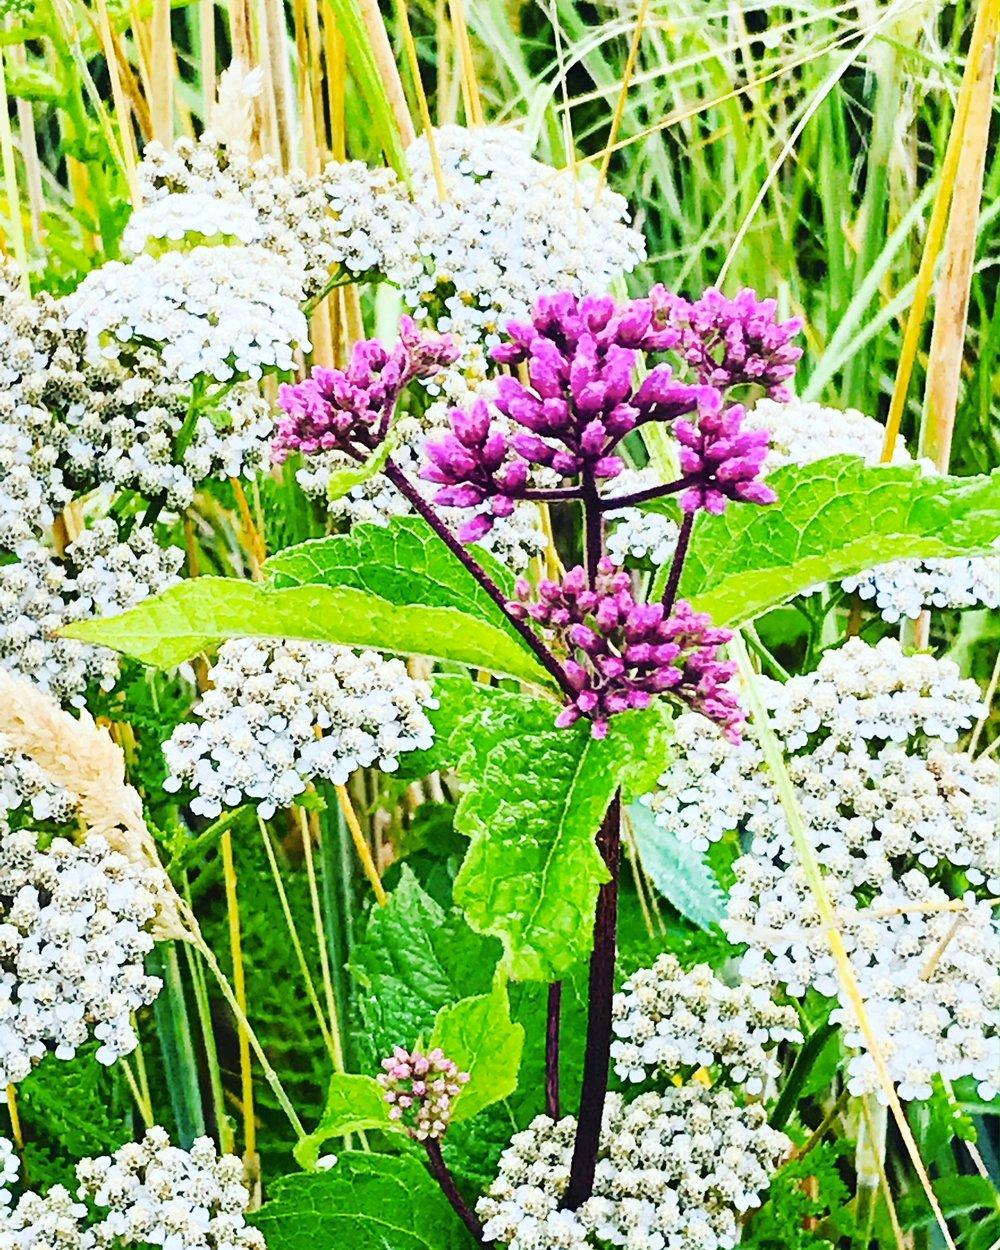 Milkweed in the Yarrow by the Brook